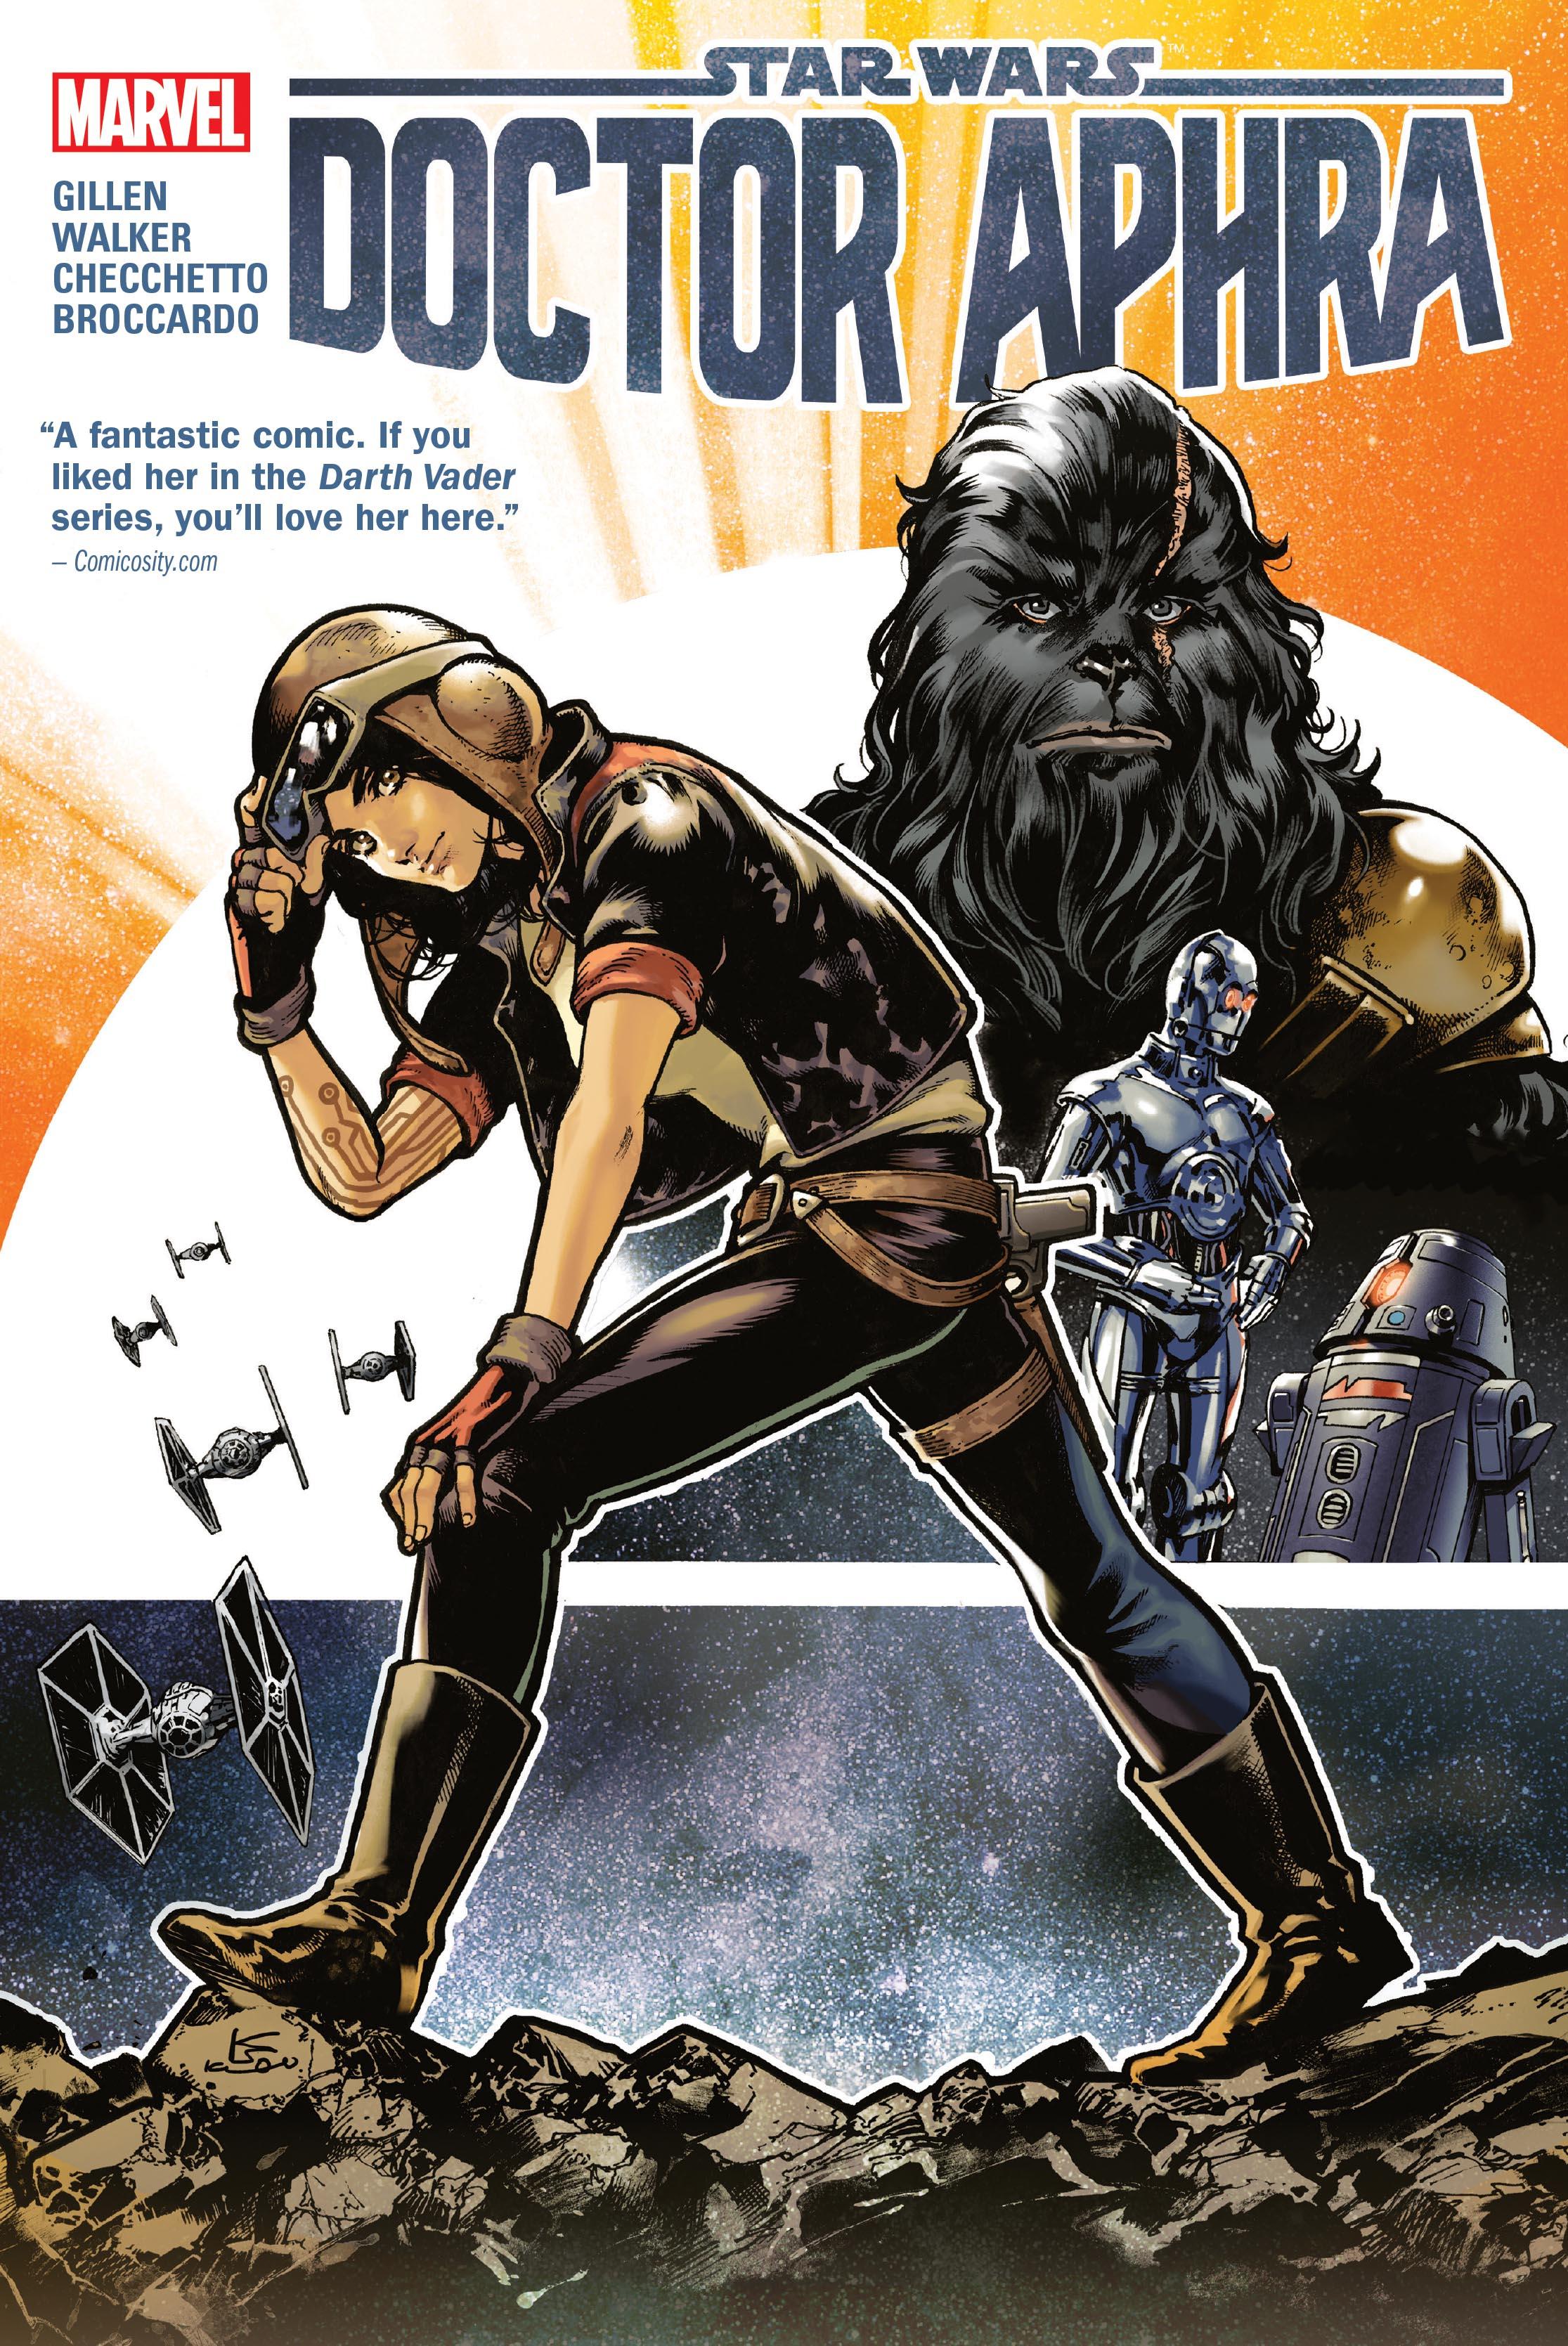 Star Wars: Doctor Aphra Vol. 1 (Hardcover)